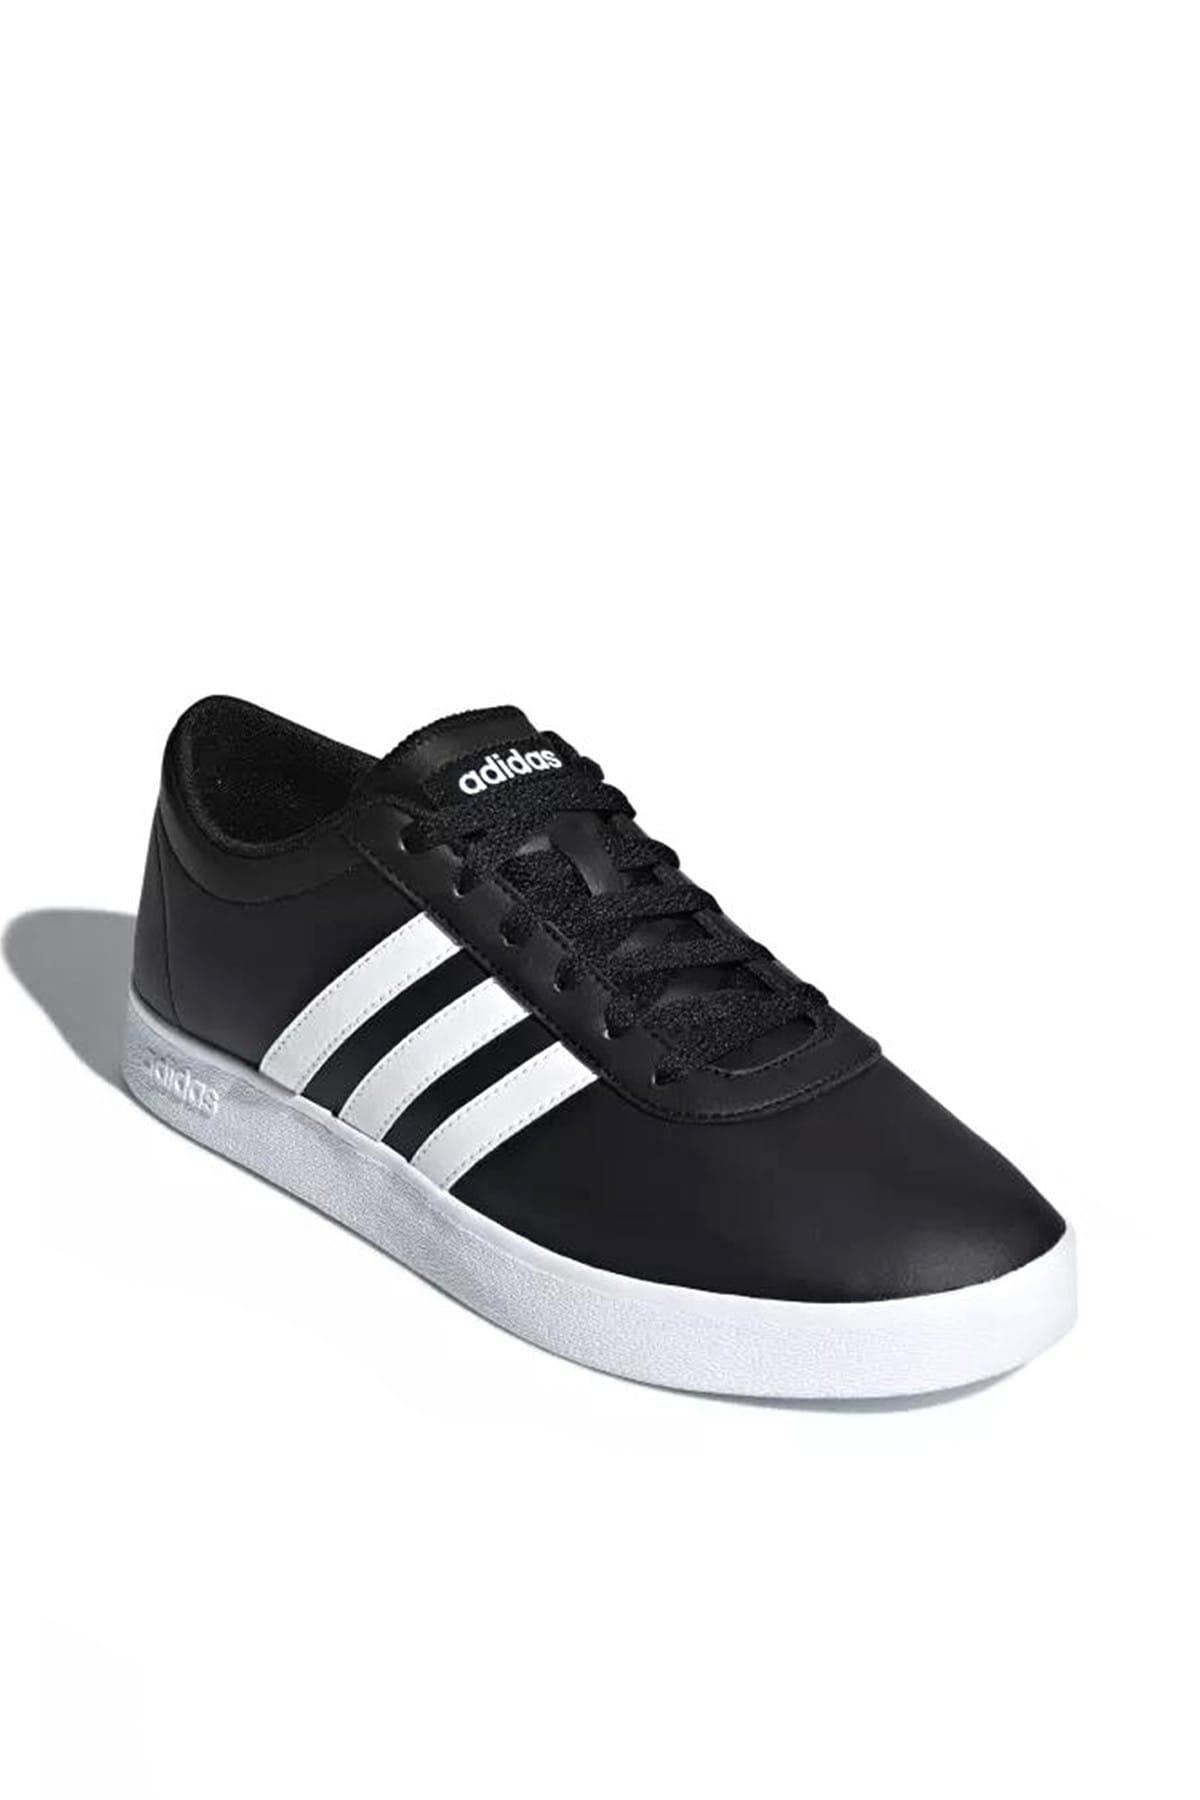 adidas Cf Advantage Siyah BEYAZ Erkek Sneaker 100351226 2